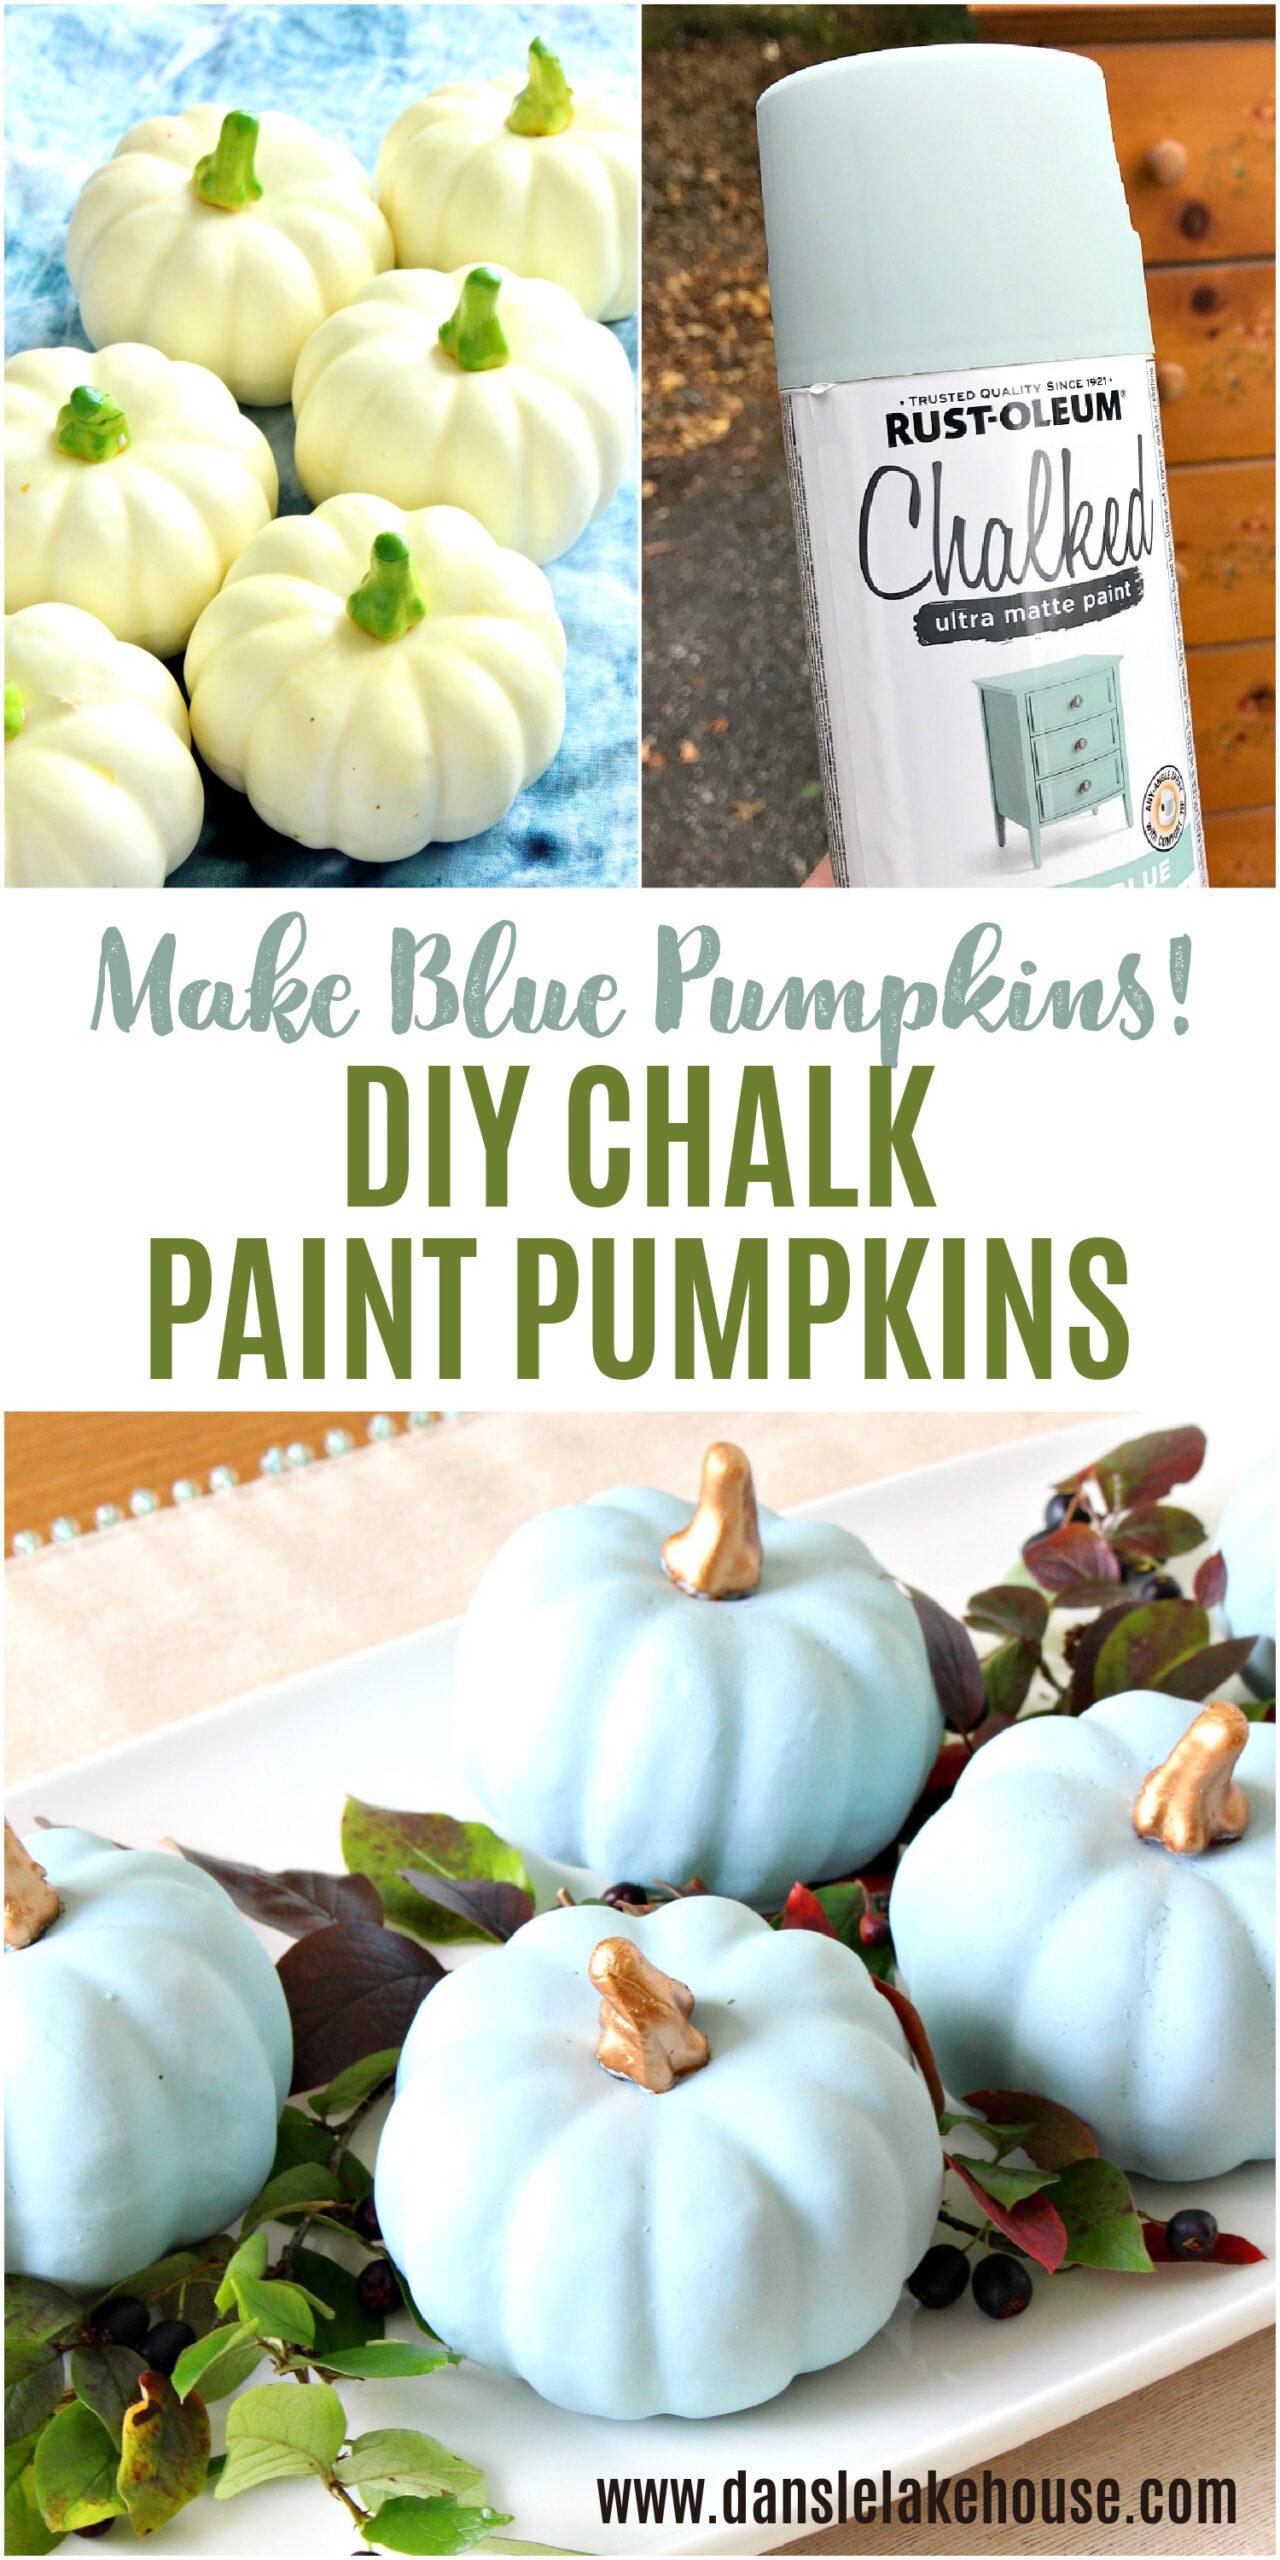 Make Your Own Blue Pumpkins